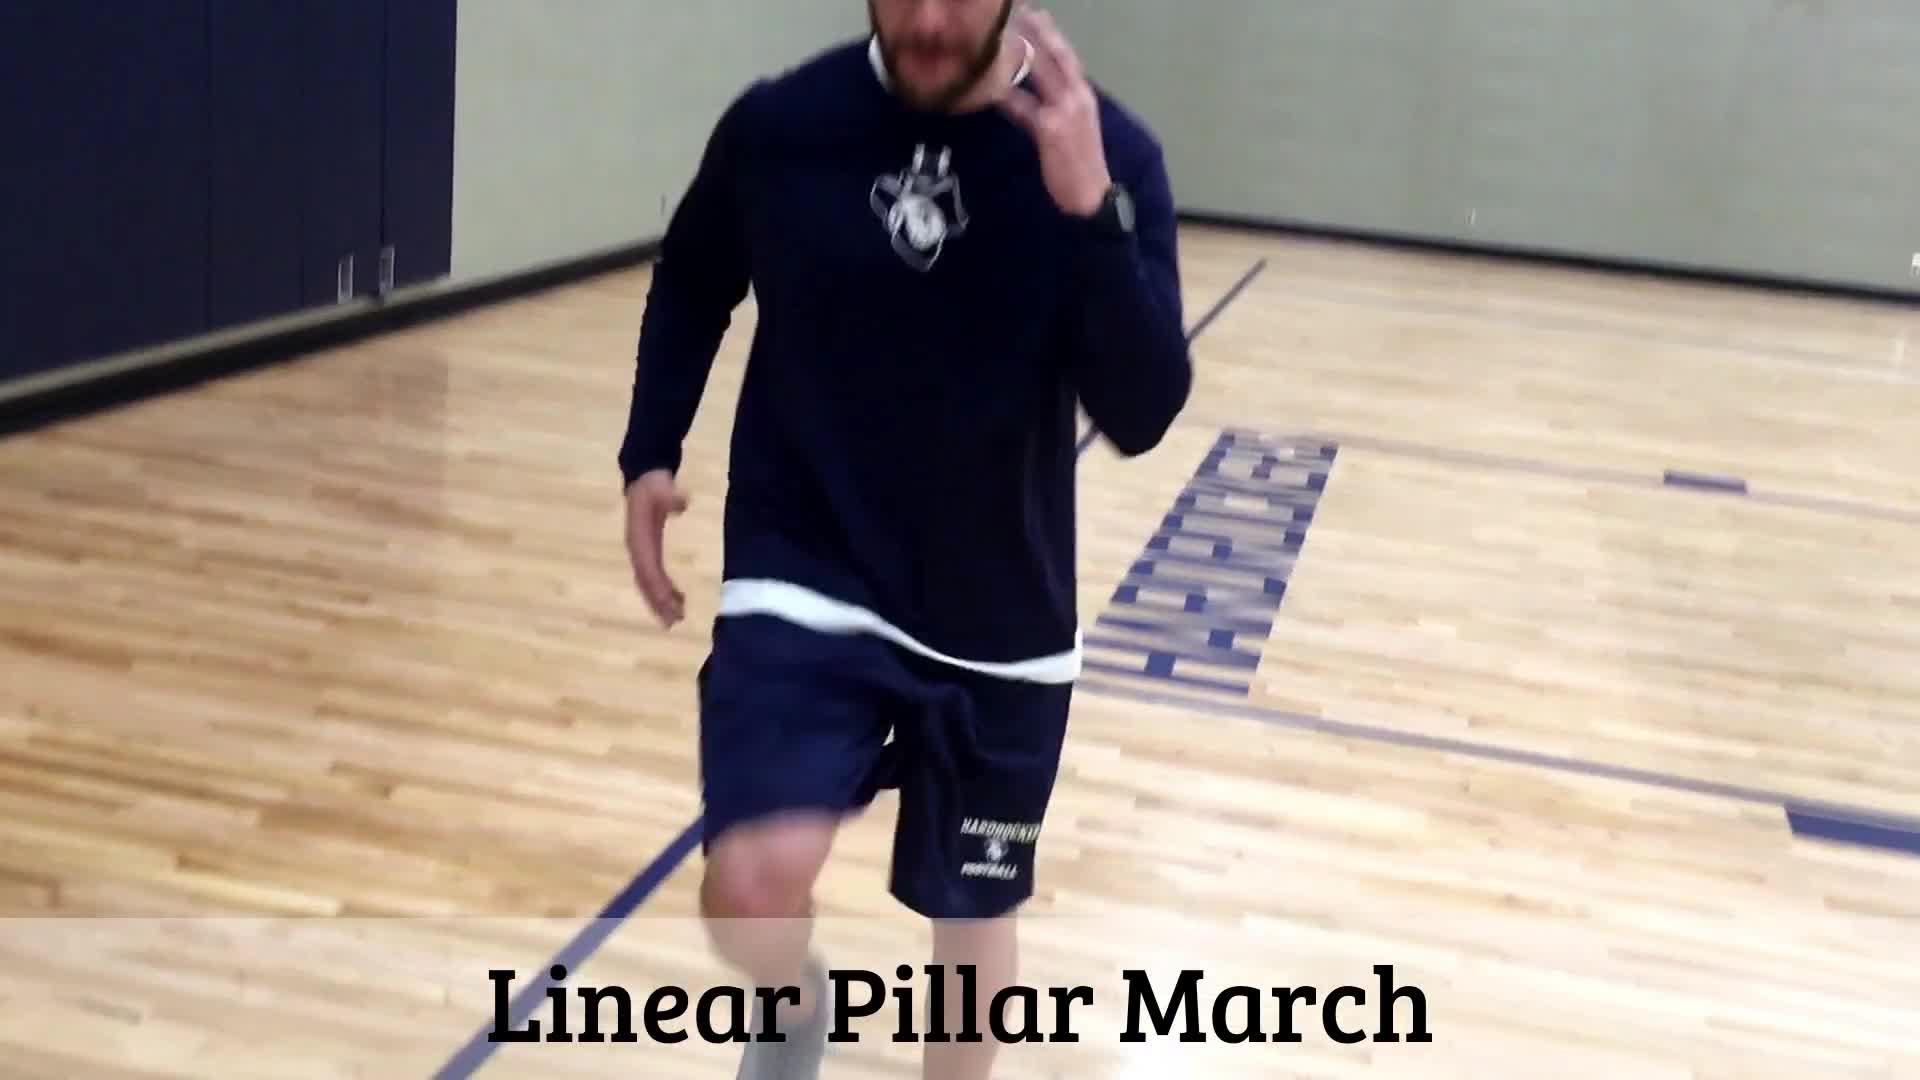 Linear Pillar March GIFs